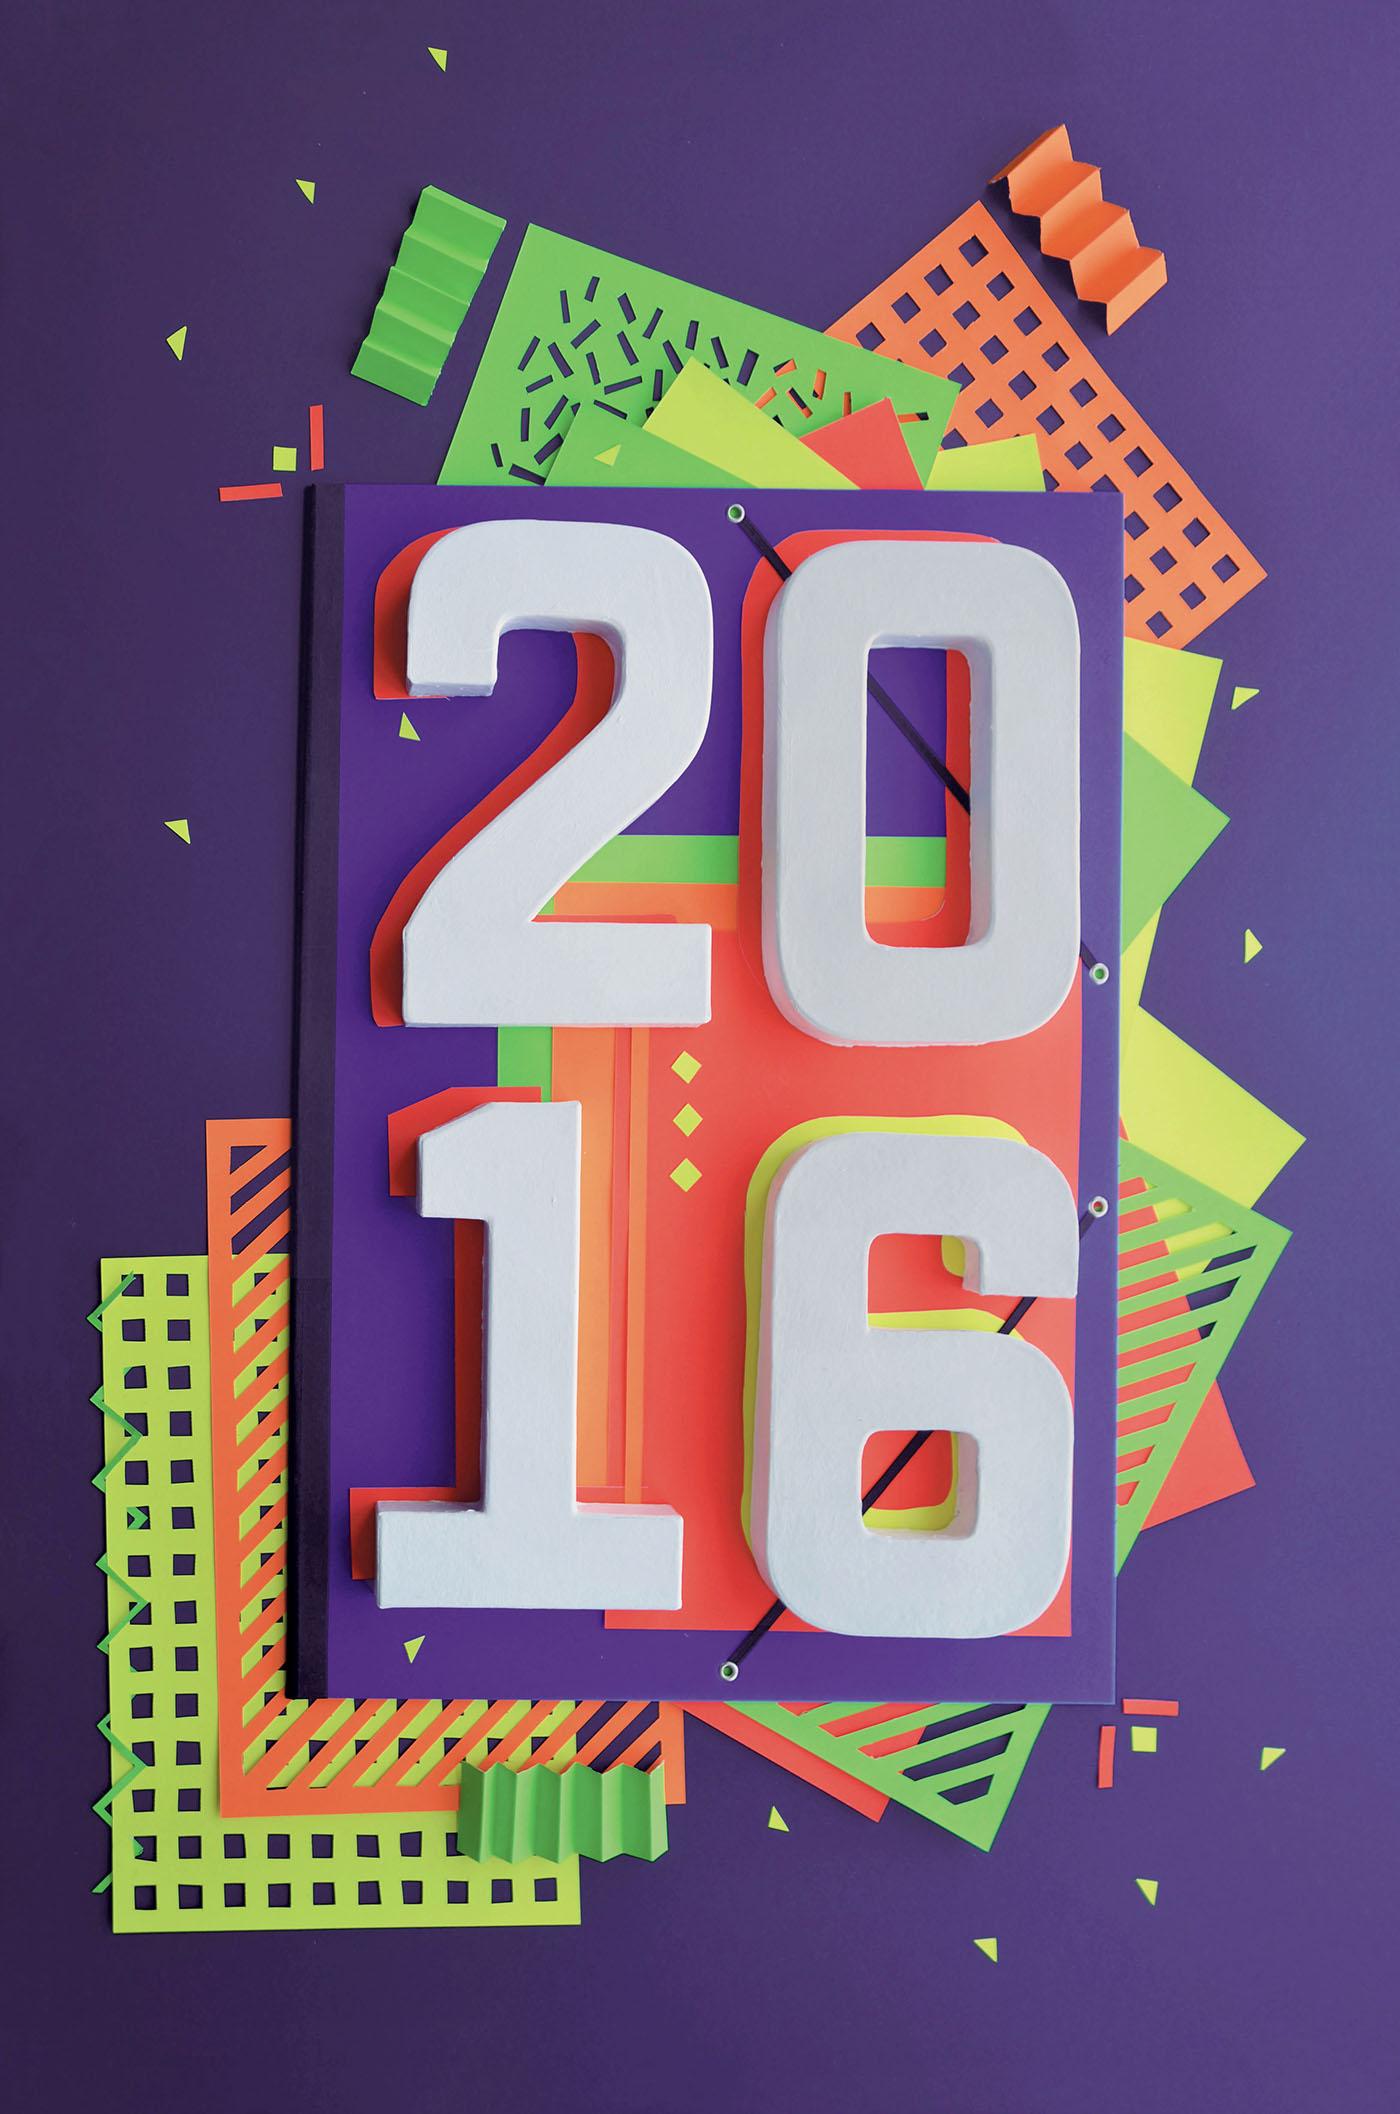 2016 greeting card